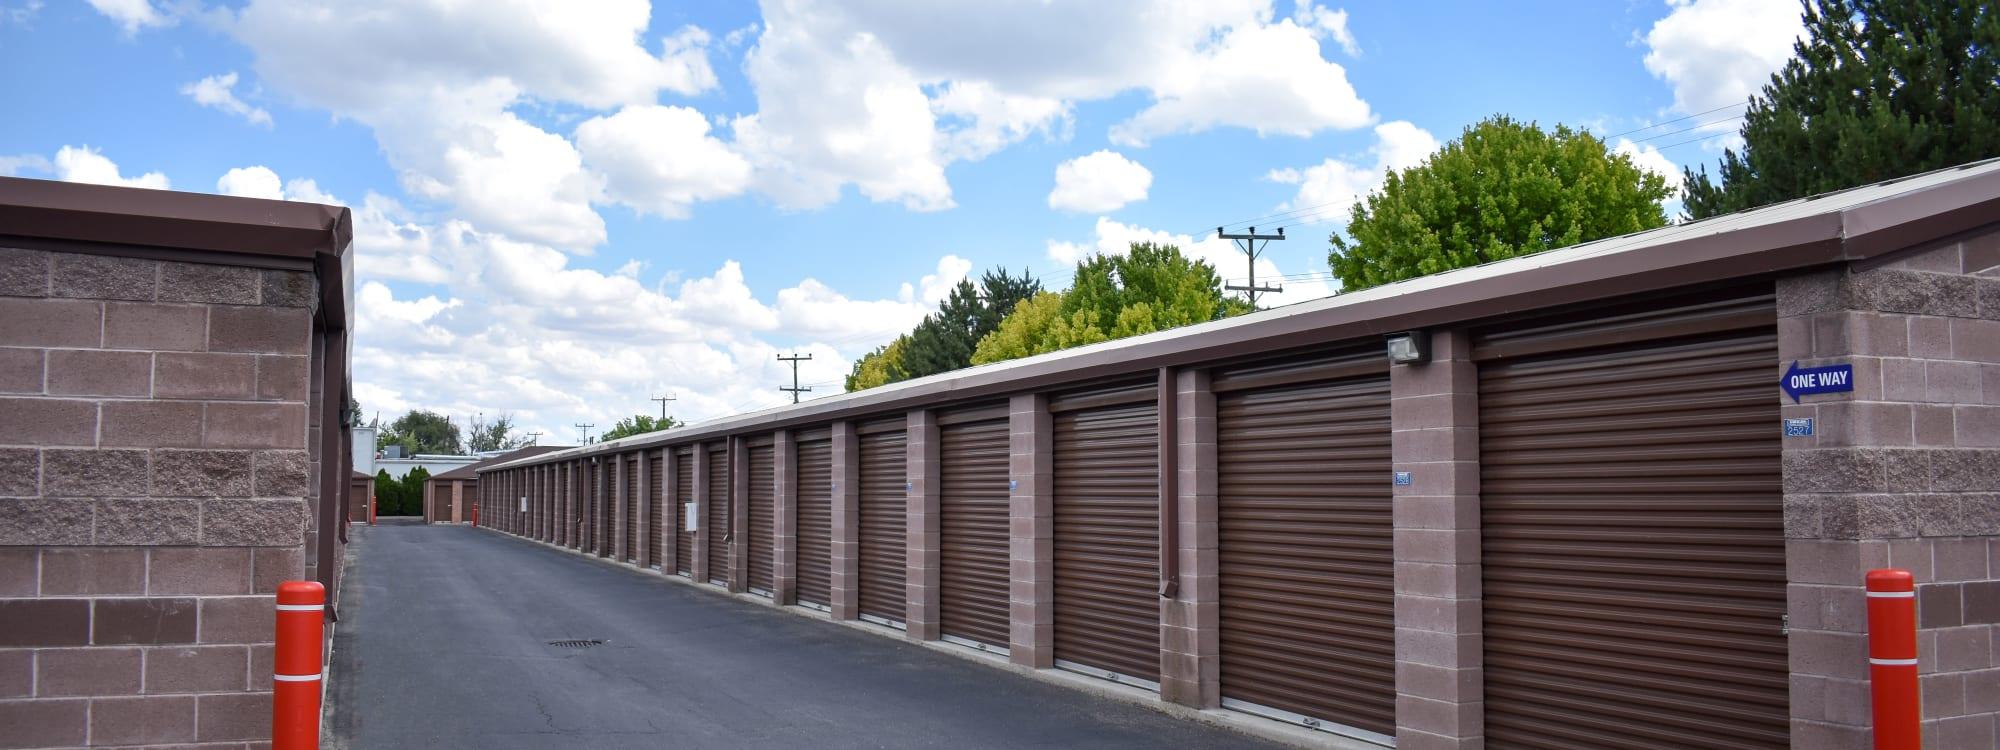 Self storage options at STOR-N-LOCK Self Storage in Boise, Idaho